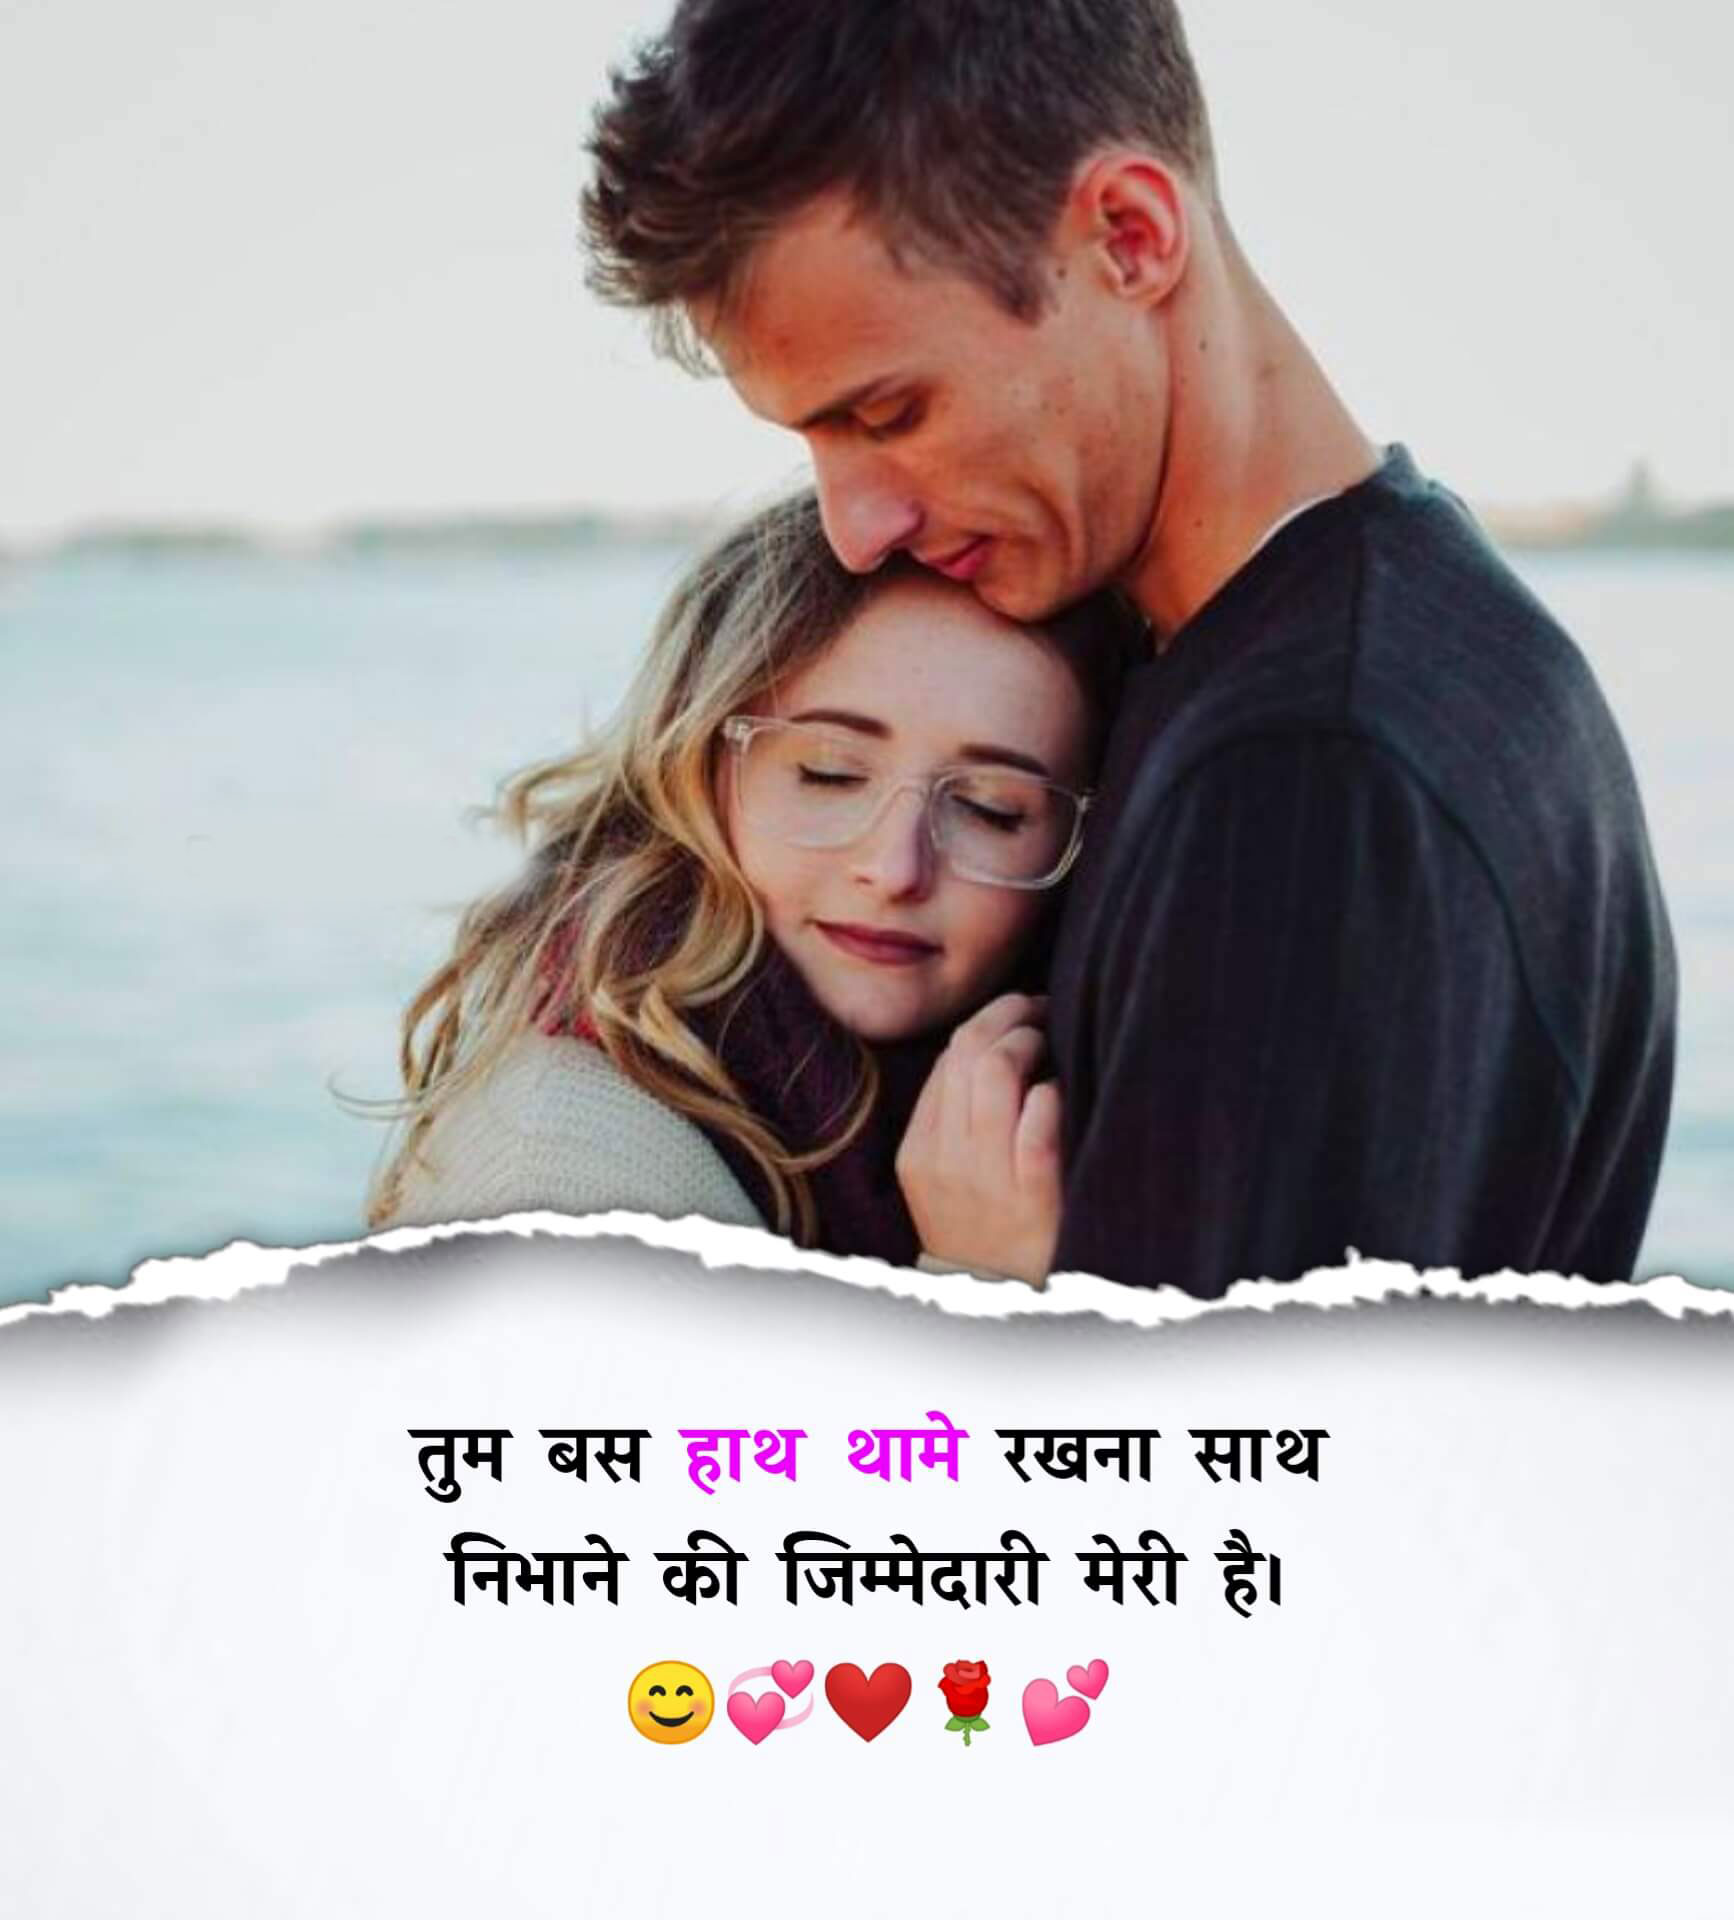 hd love shayari Latest Status Dp Images pics